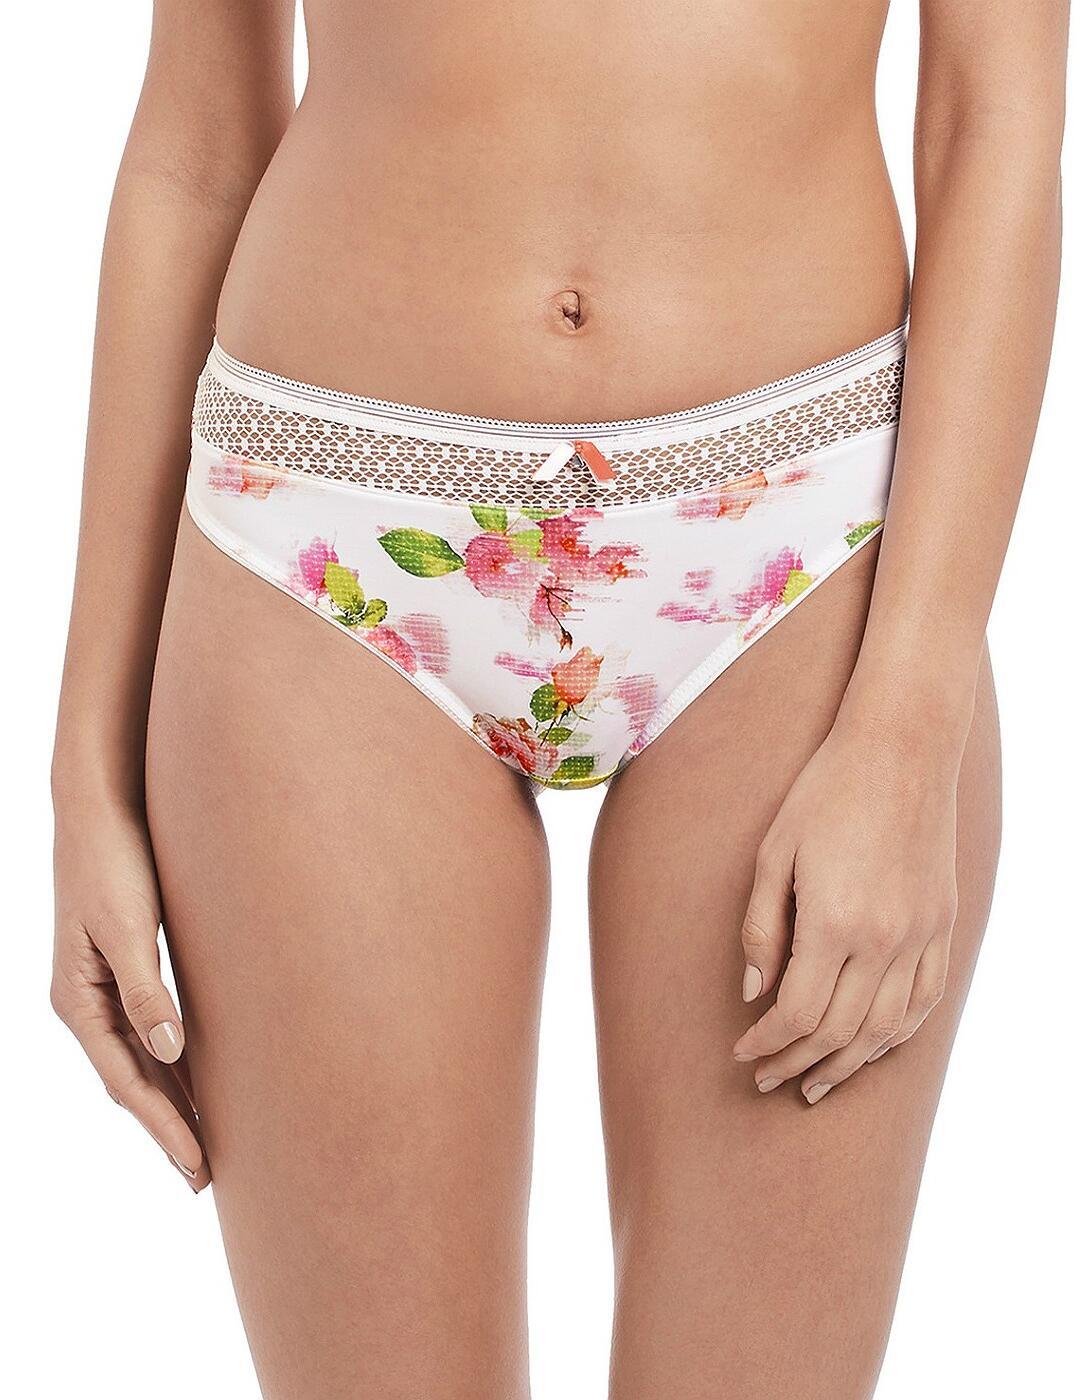 Freya Florri Brazilian Brief 3107 New Womens Knickers White Floral Lingerie